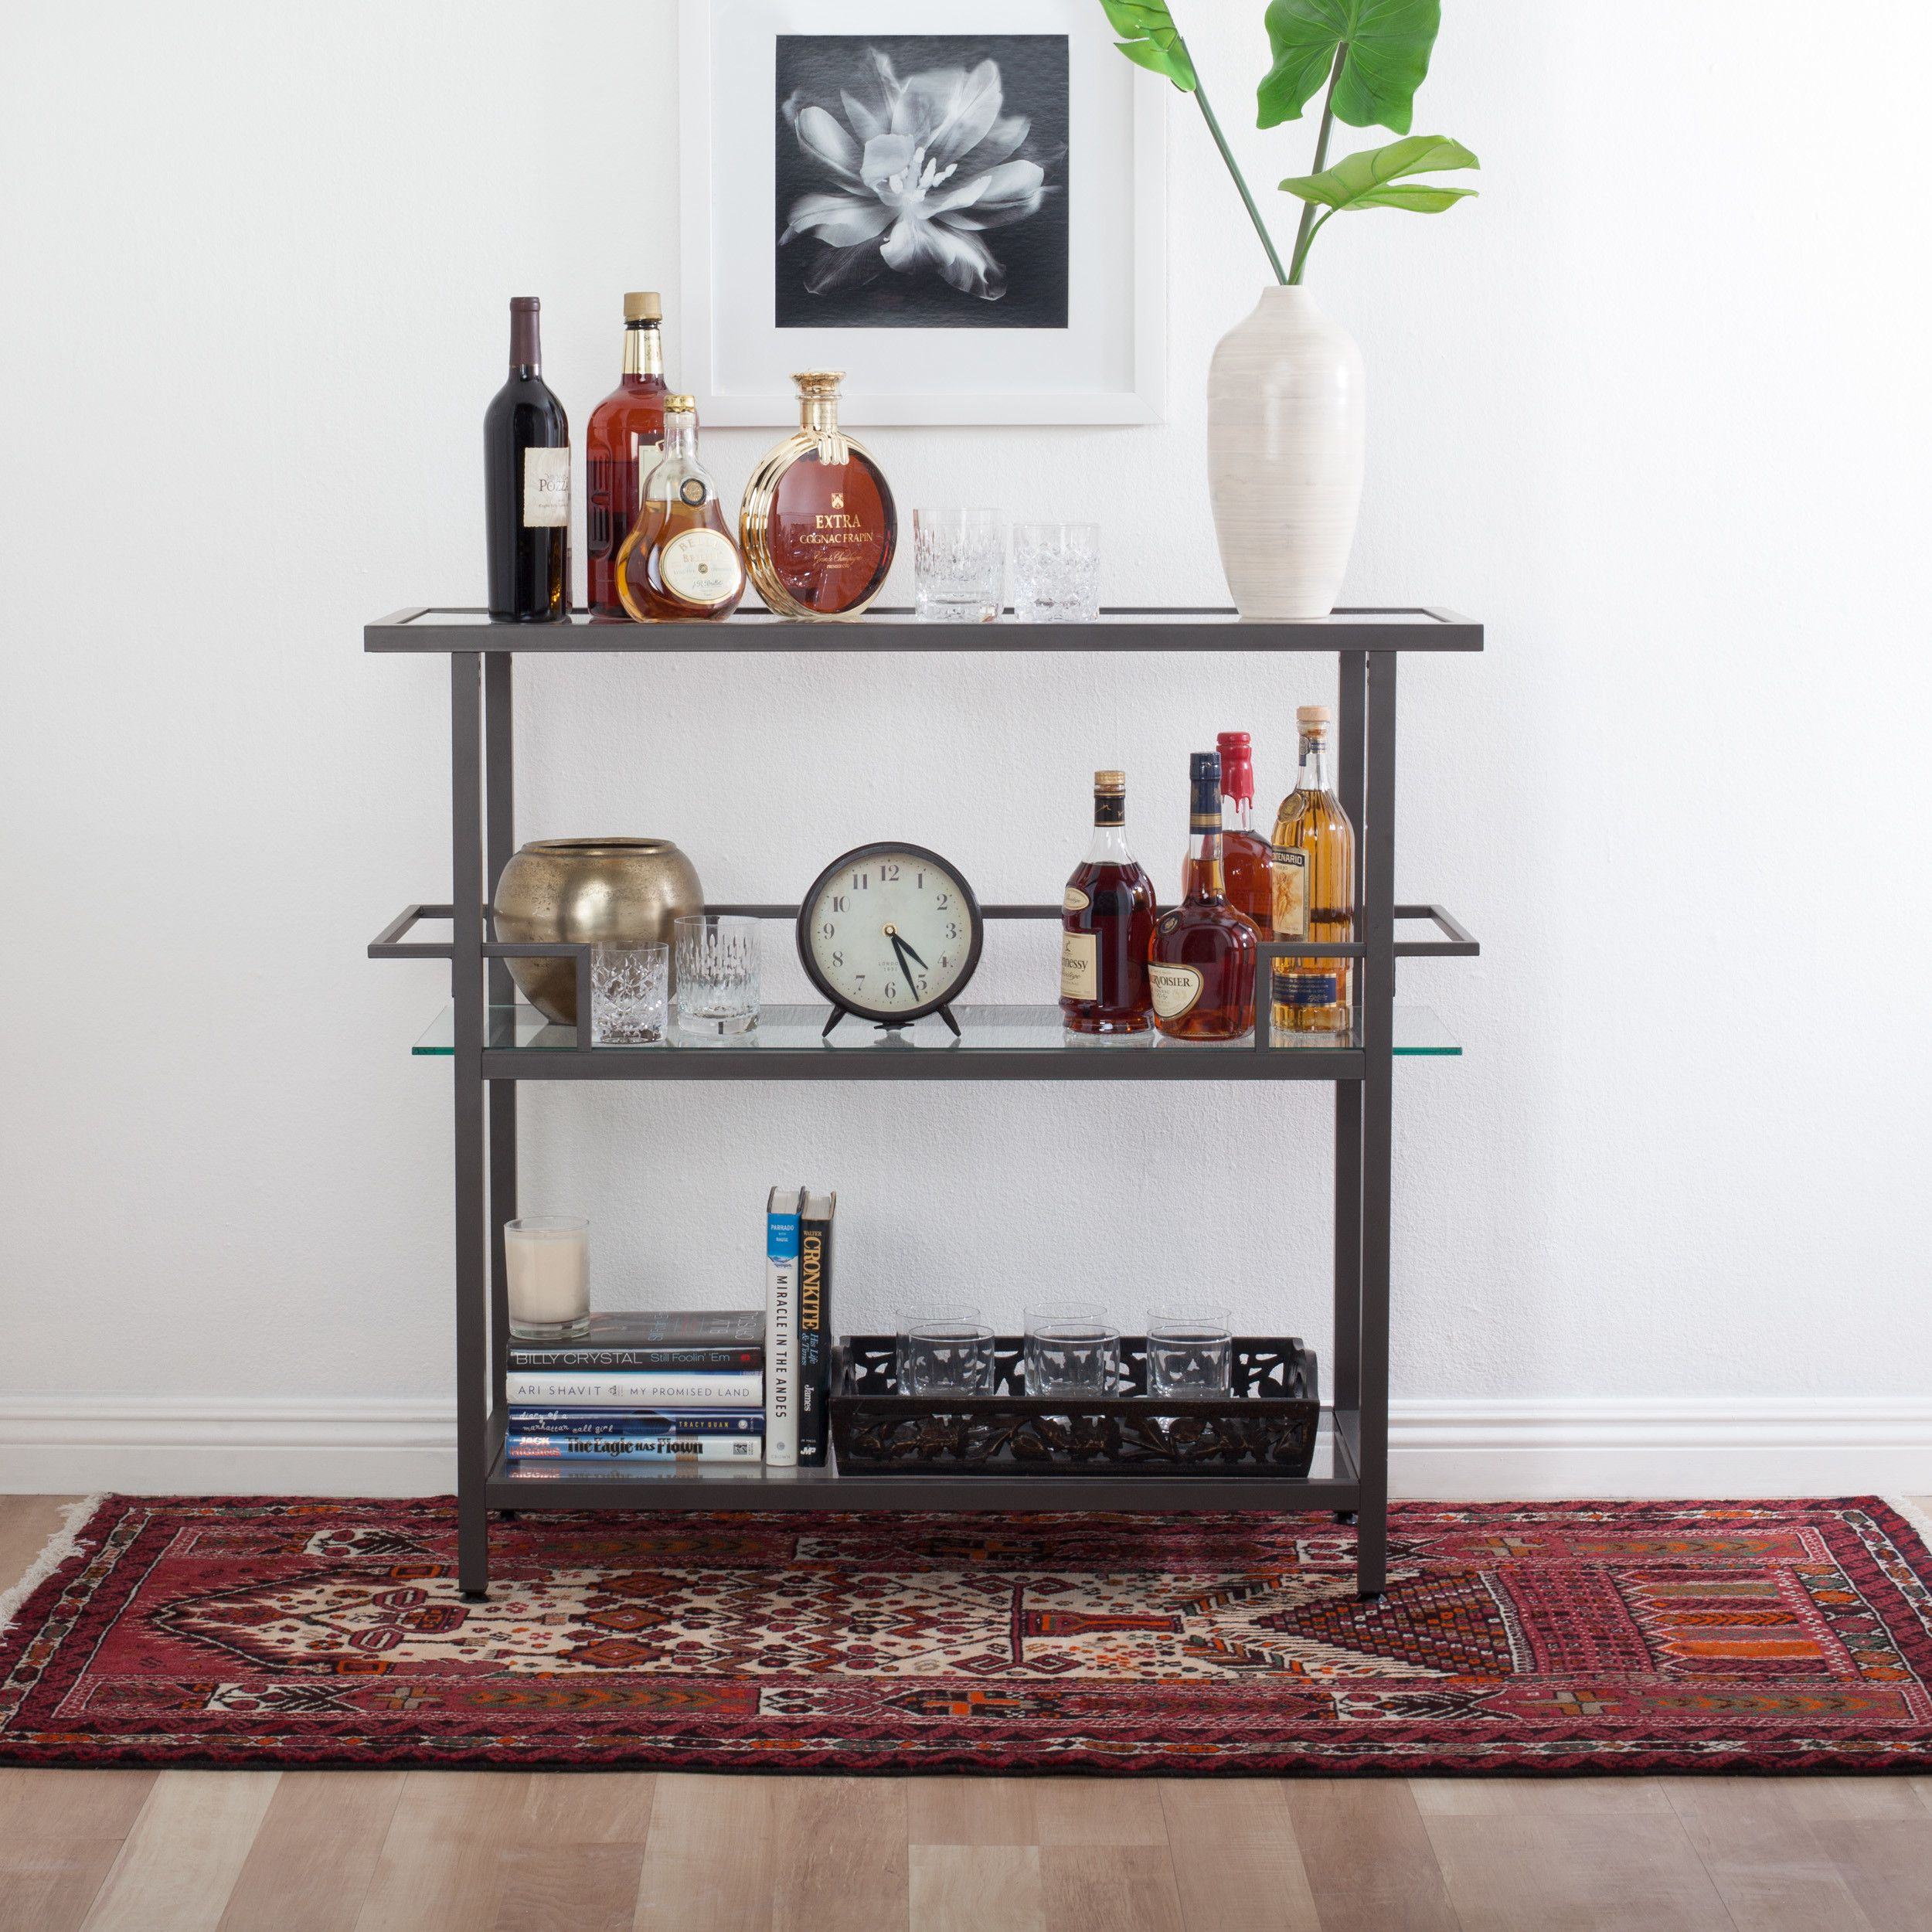 Piloti Bar | Studio design, Bar and Studio